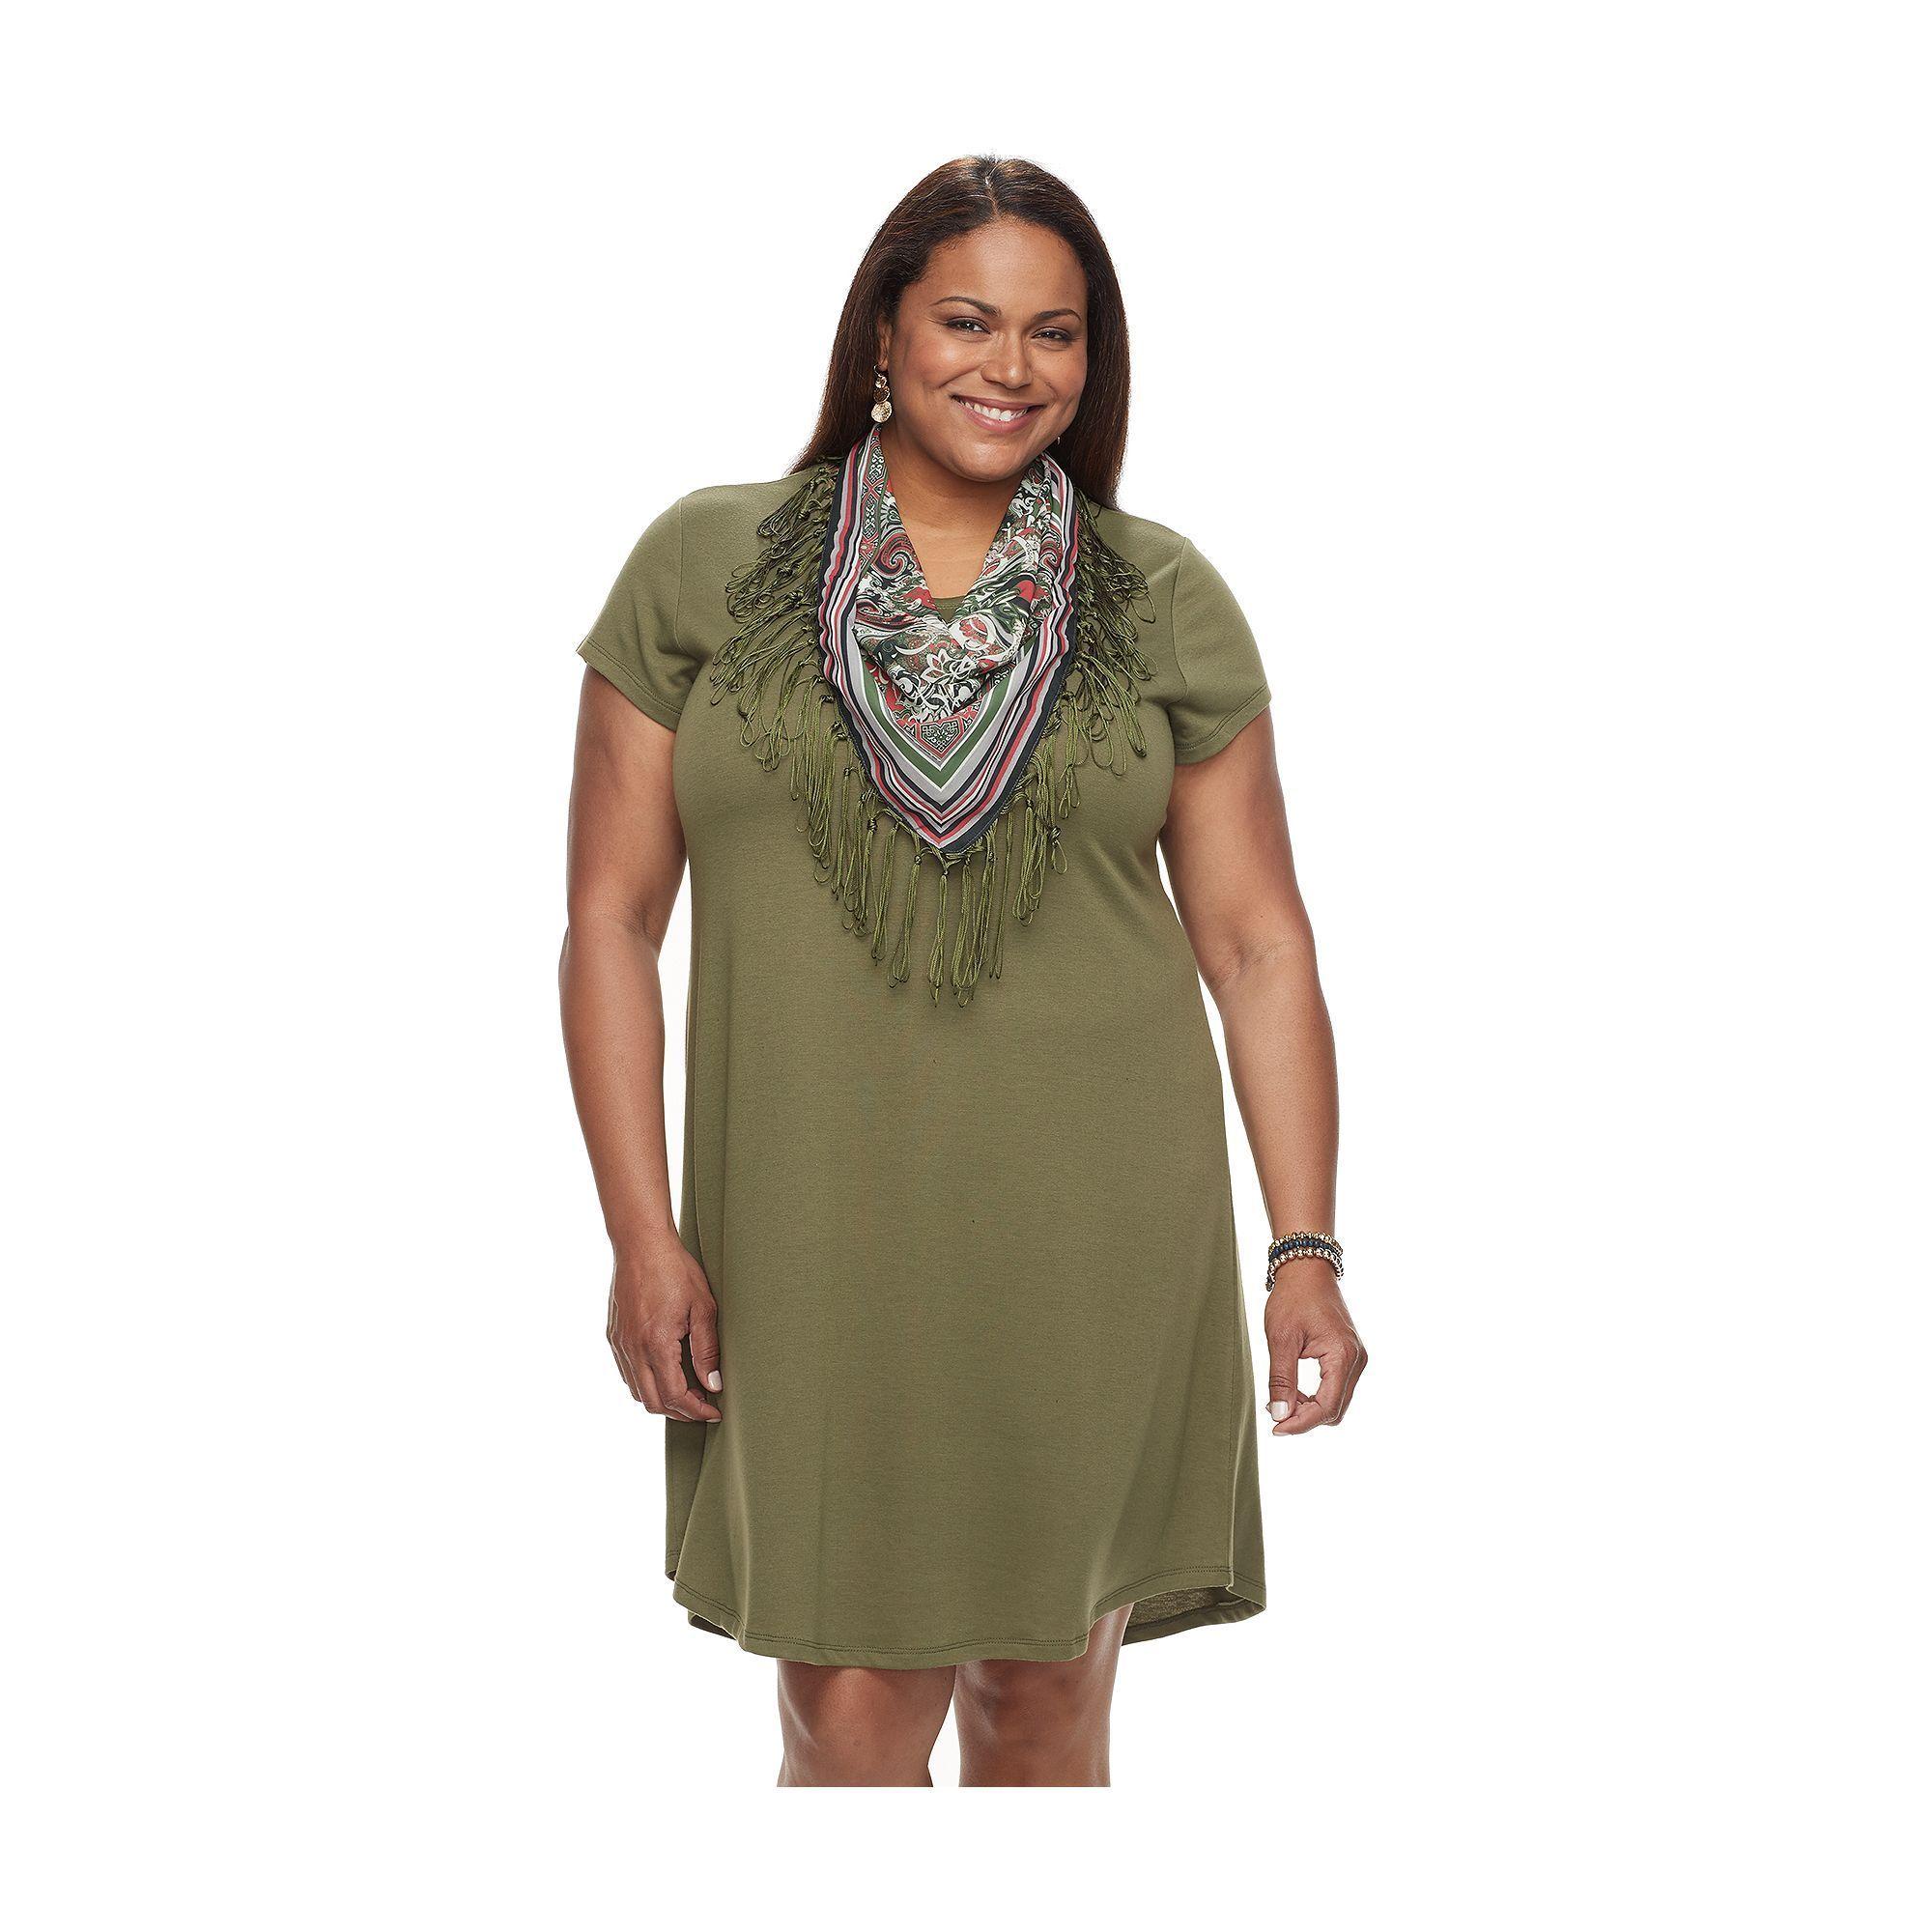 Dark green dress shirt  Plus Size World Unity TShirt Dress u Scarf Set Womenus Size XL